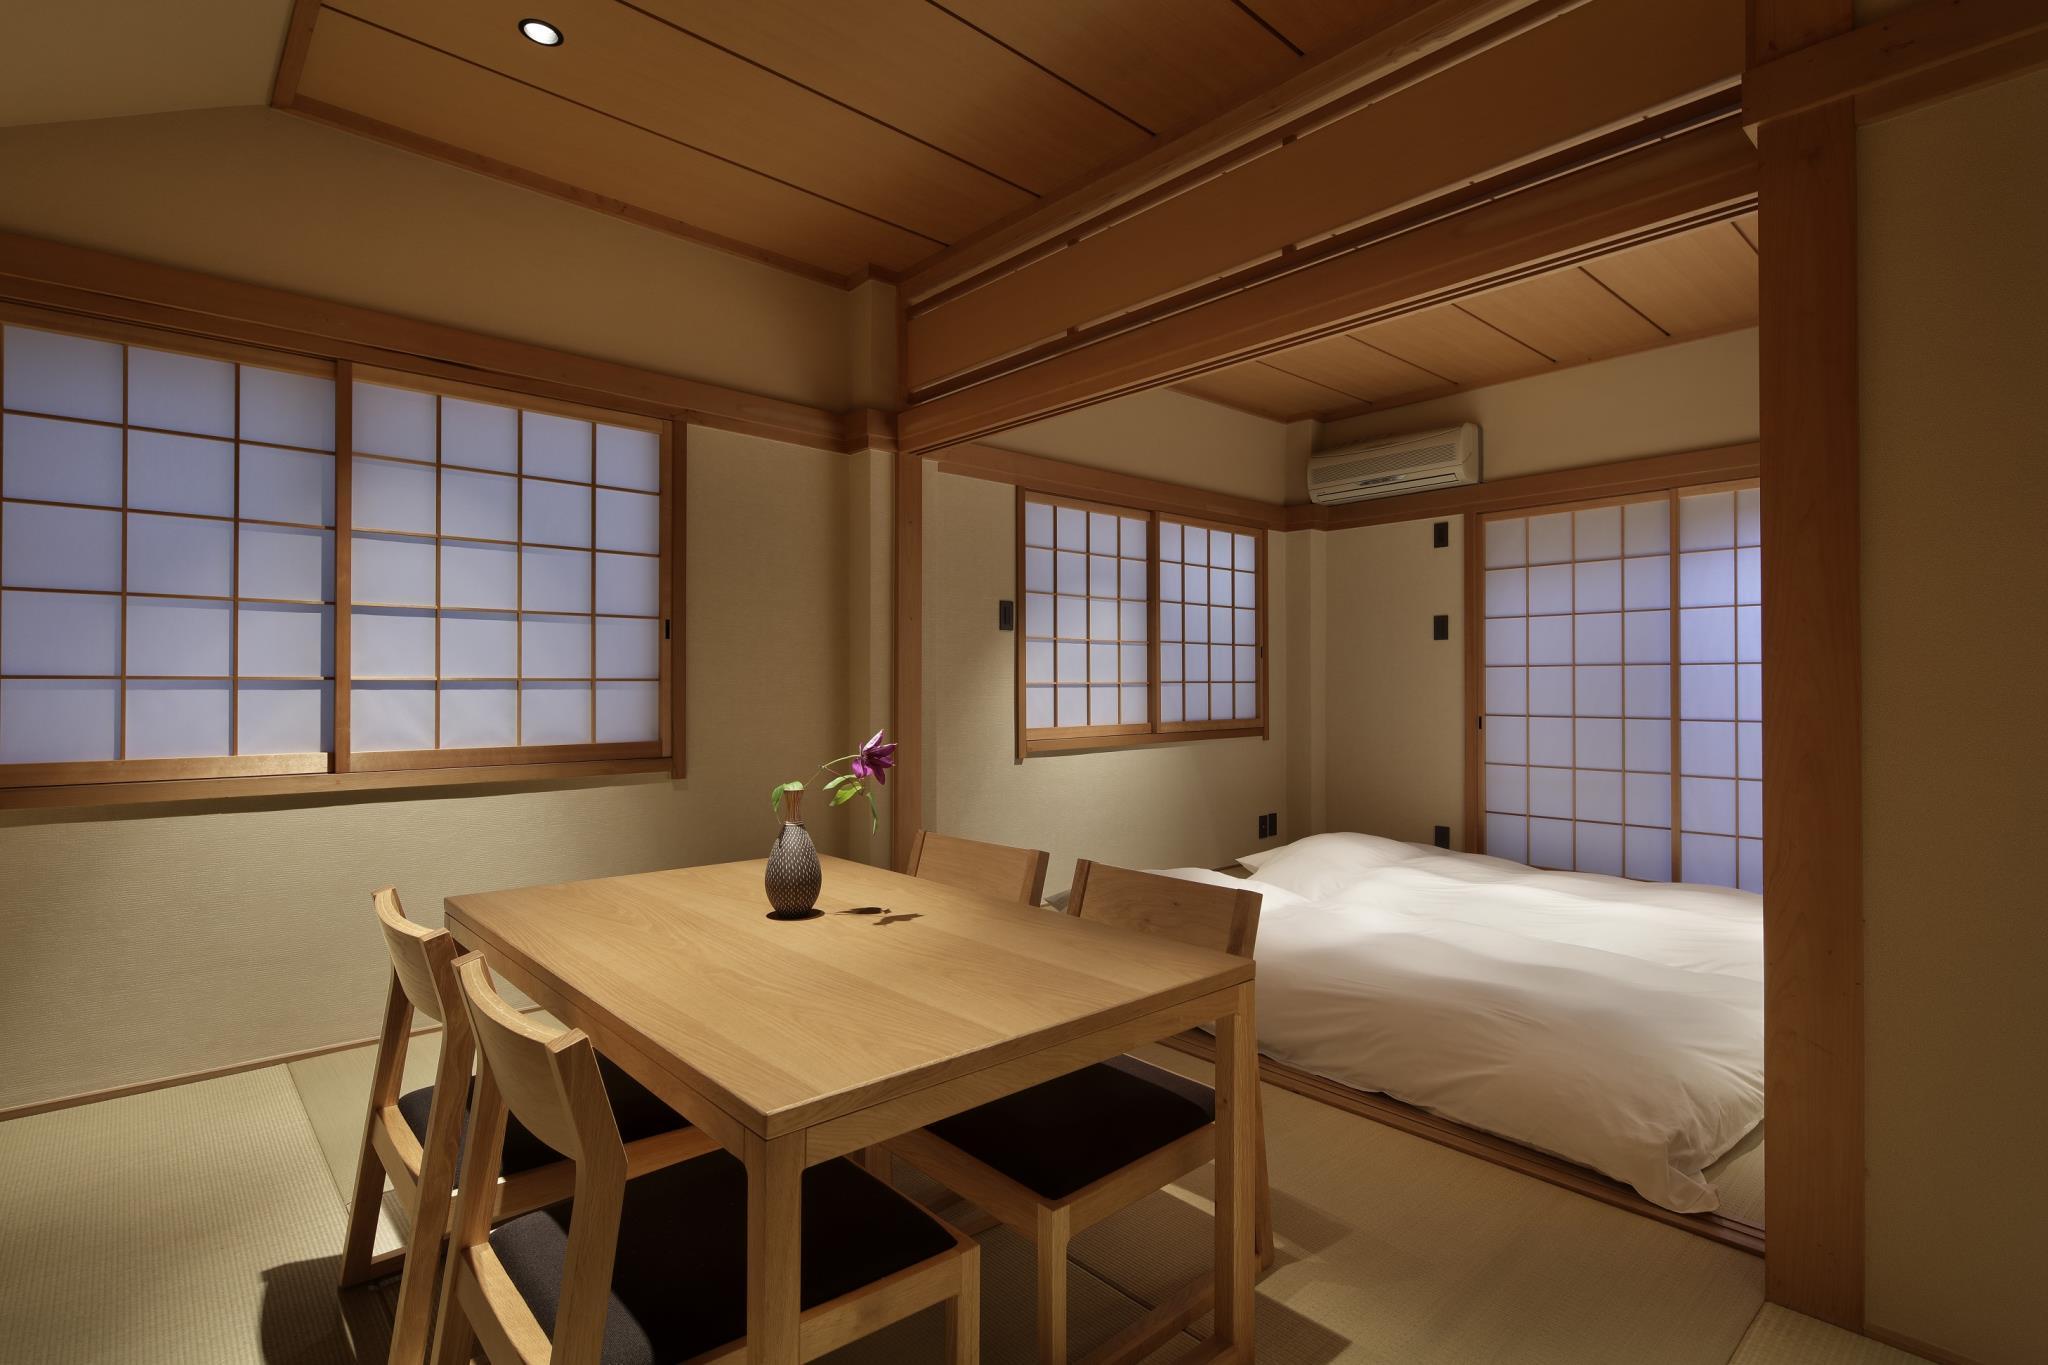 Legal  Great Deal Star House Near Kiyomizu Temple